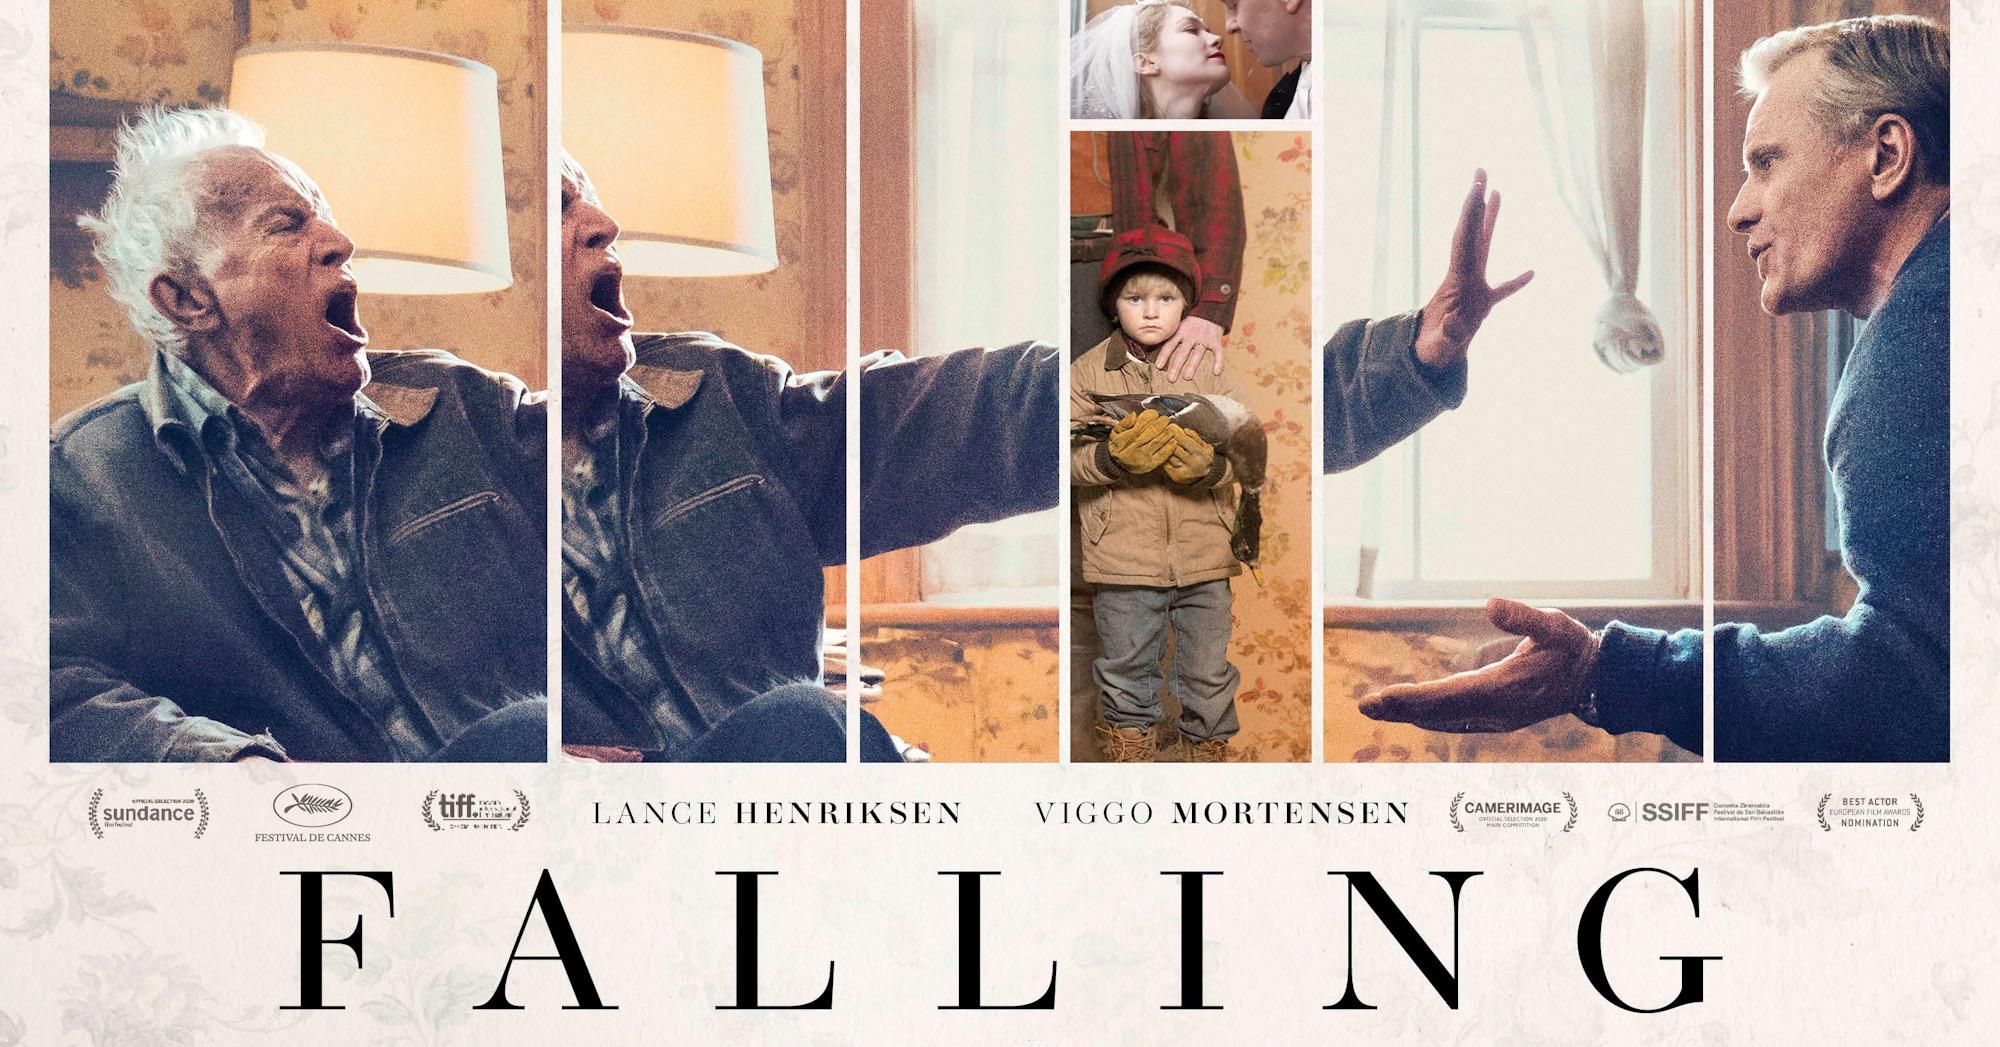 Cinema weekend: FALLING - Venerdì 1 Ottobre alle 21, Sabato 2 Ottobre alle 21, Domenica 3 Ottobre alle 18:15 e alle 21